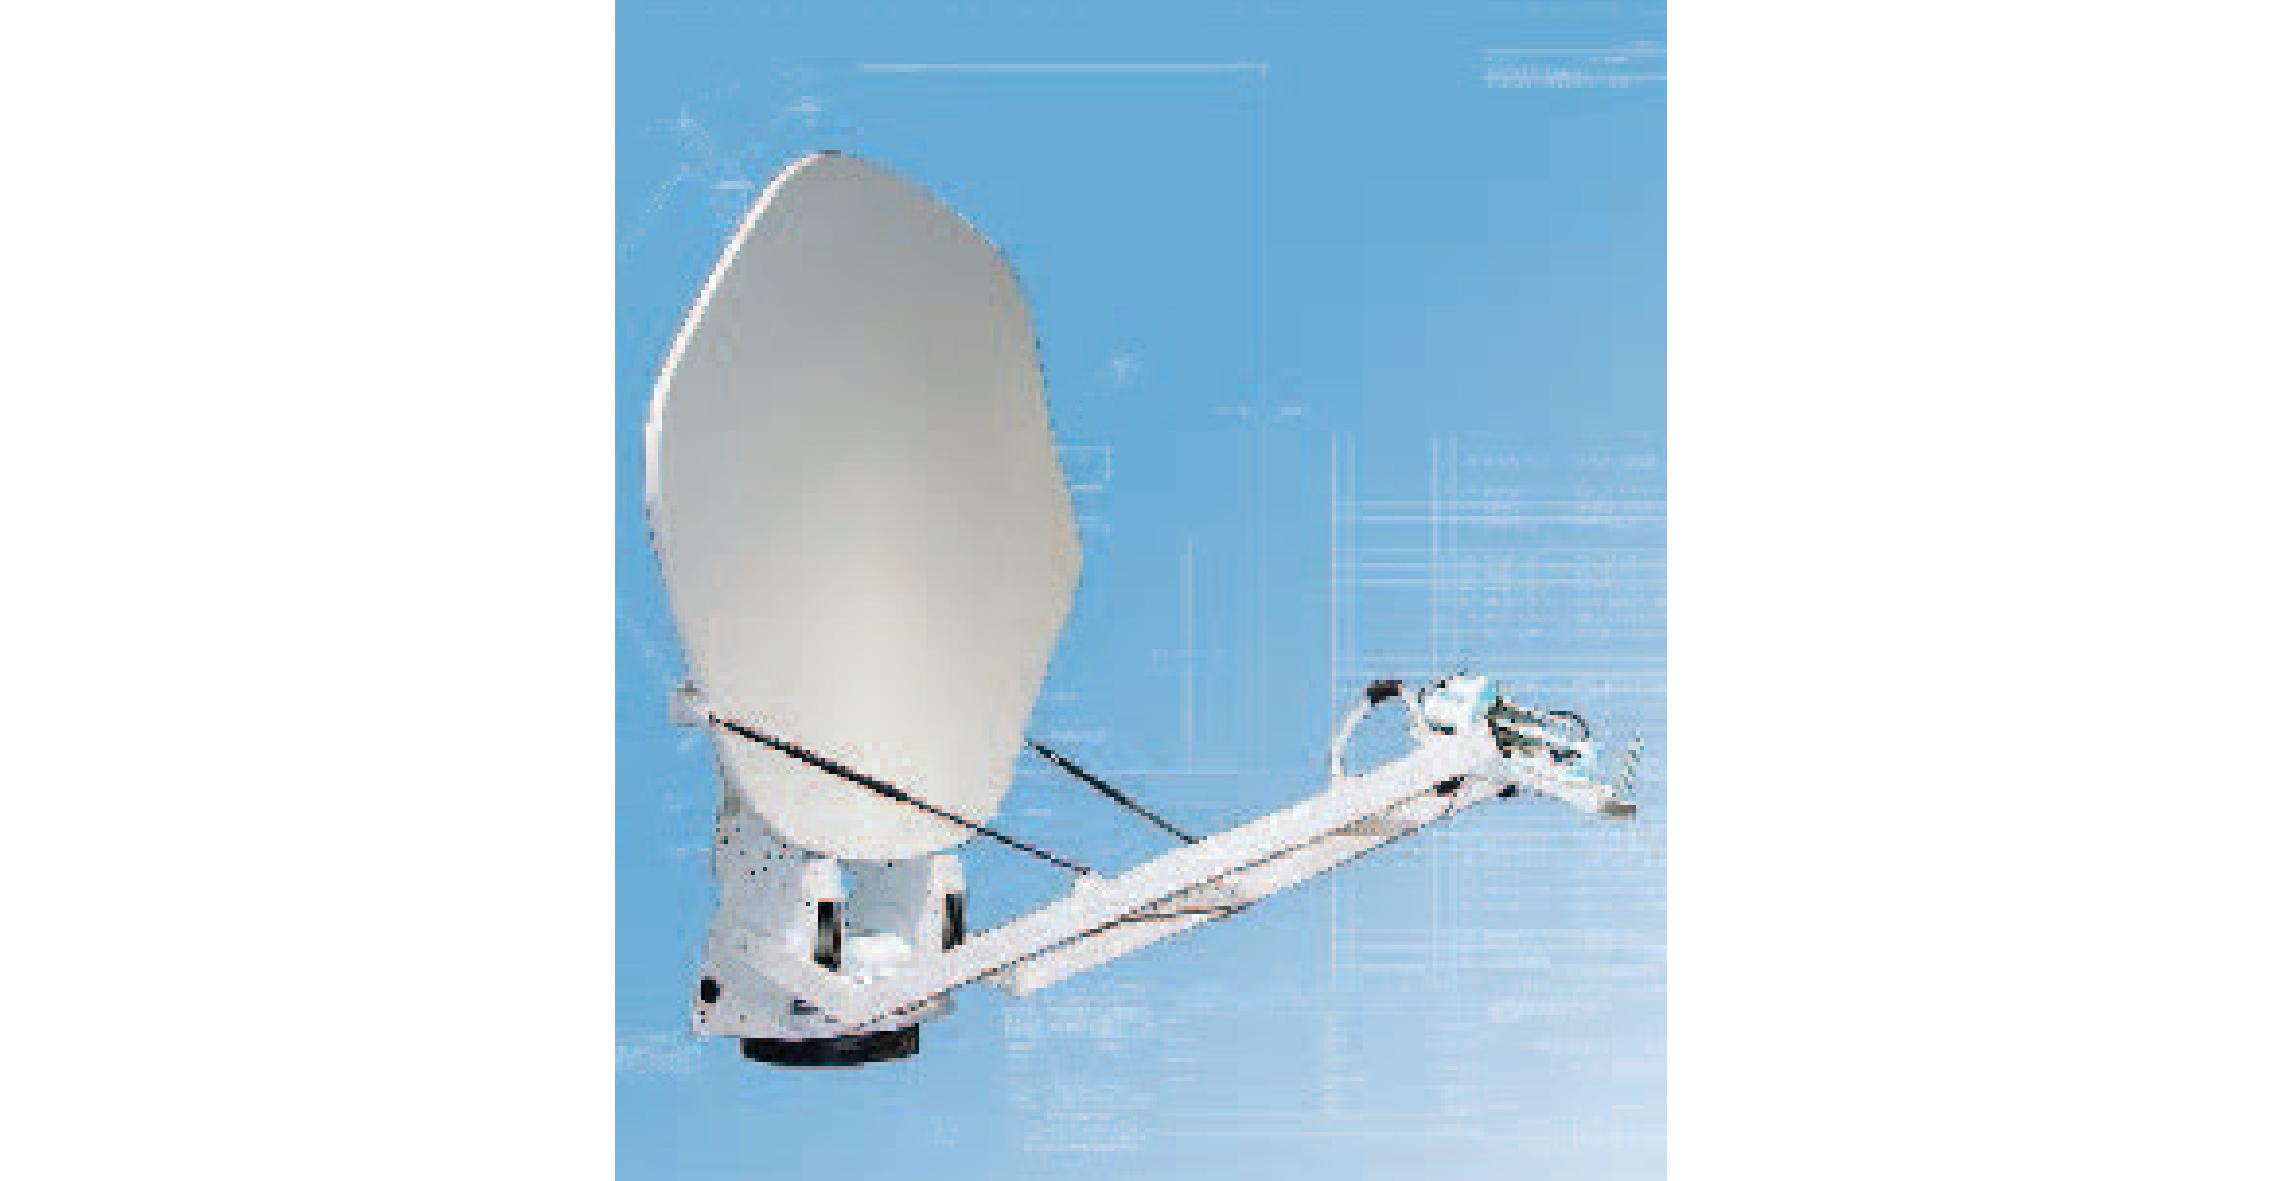 C240M 2.4m. Antenna